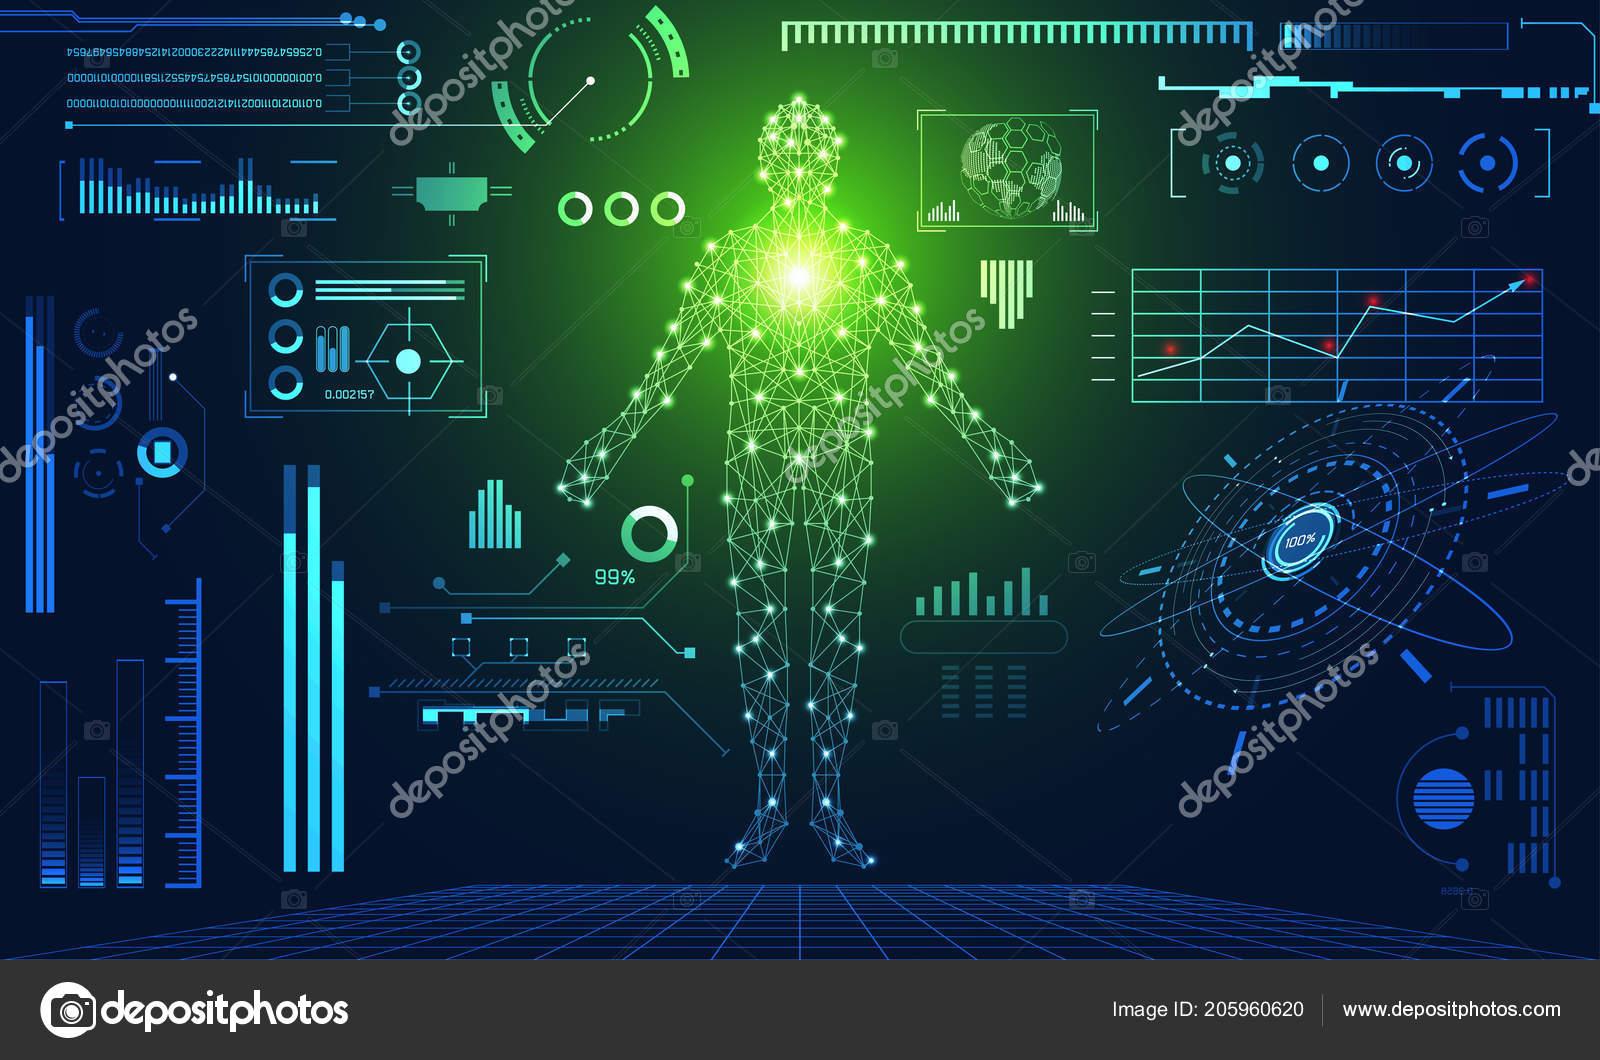 Abstract Technology Ui Futuristic Concept Hud Interface Hologram Elements Of Digital Data Chart Communication Computinghuman Body Health Care